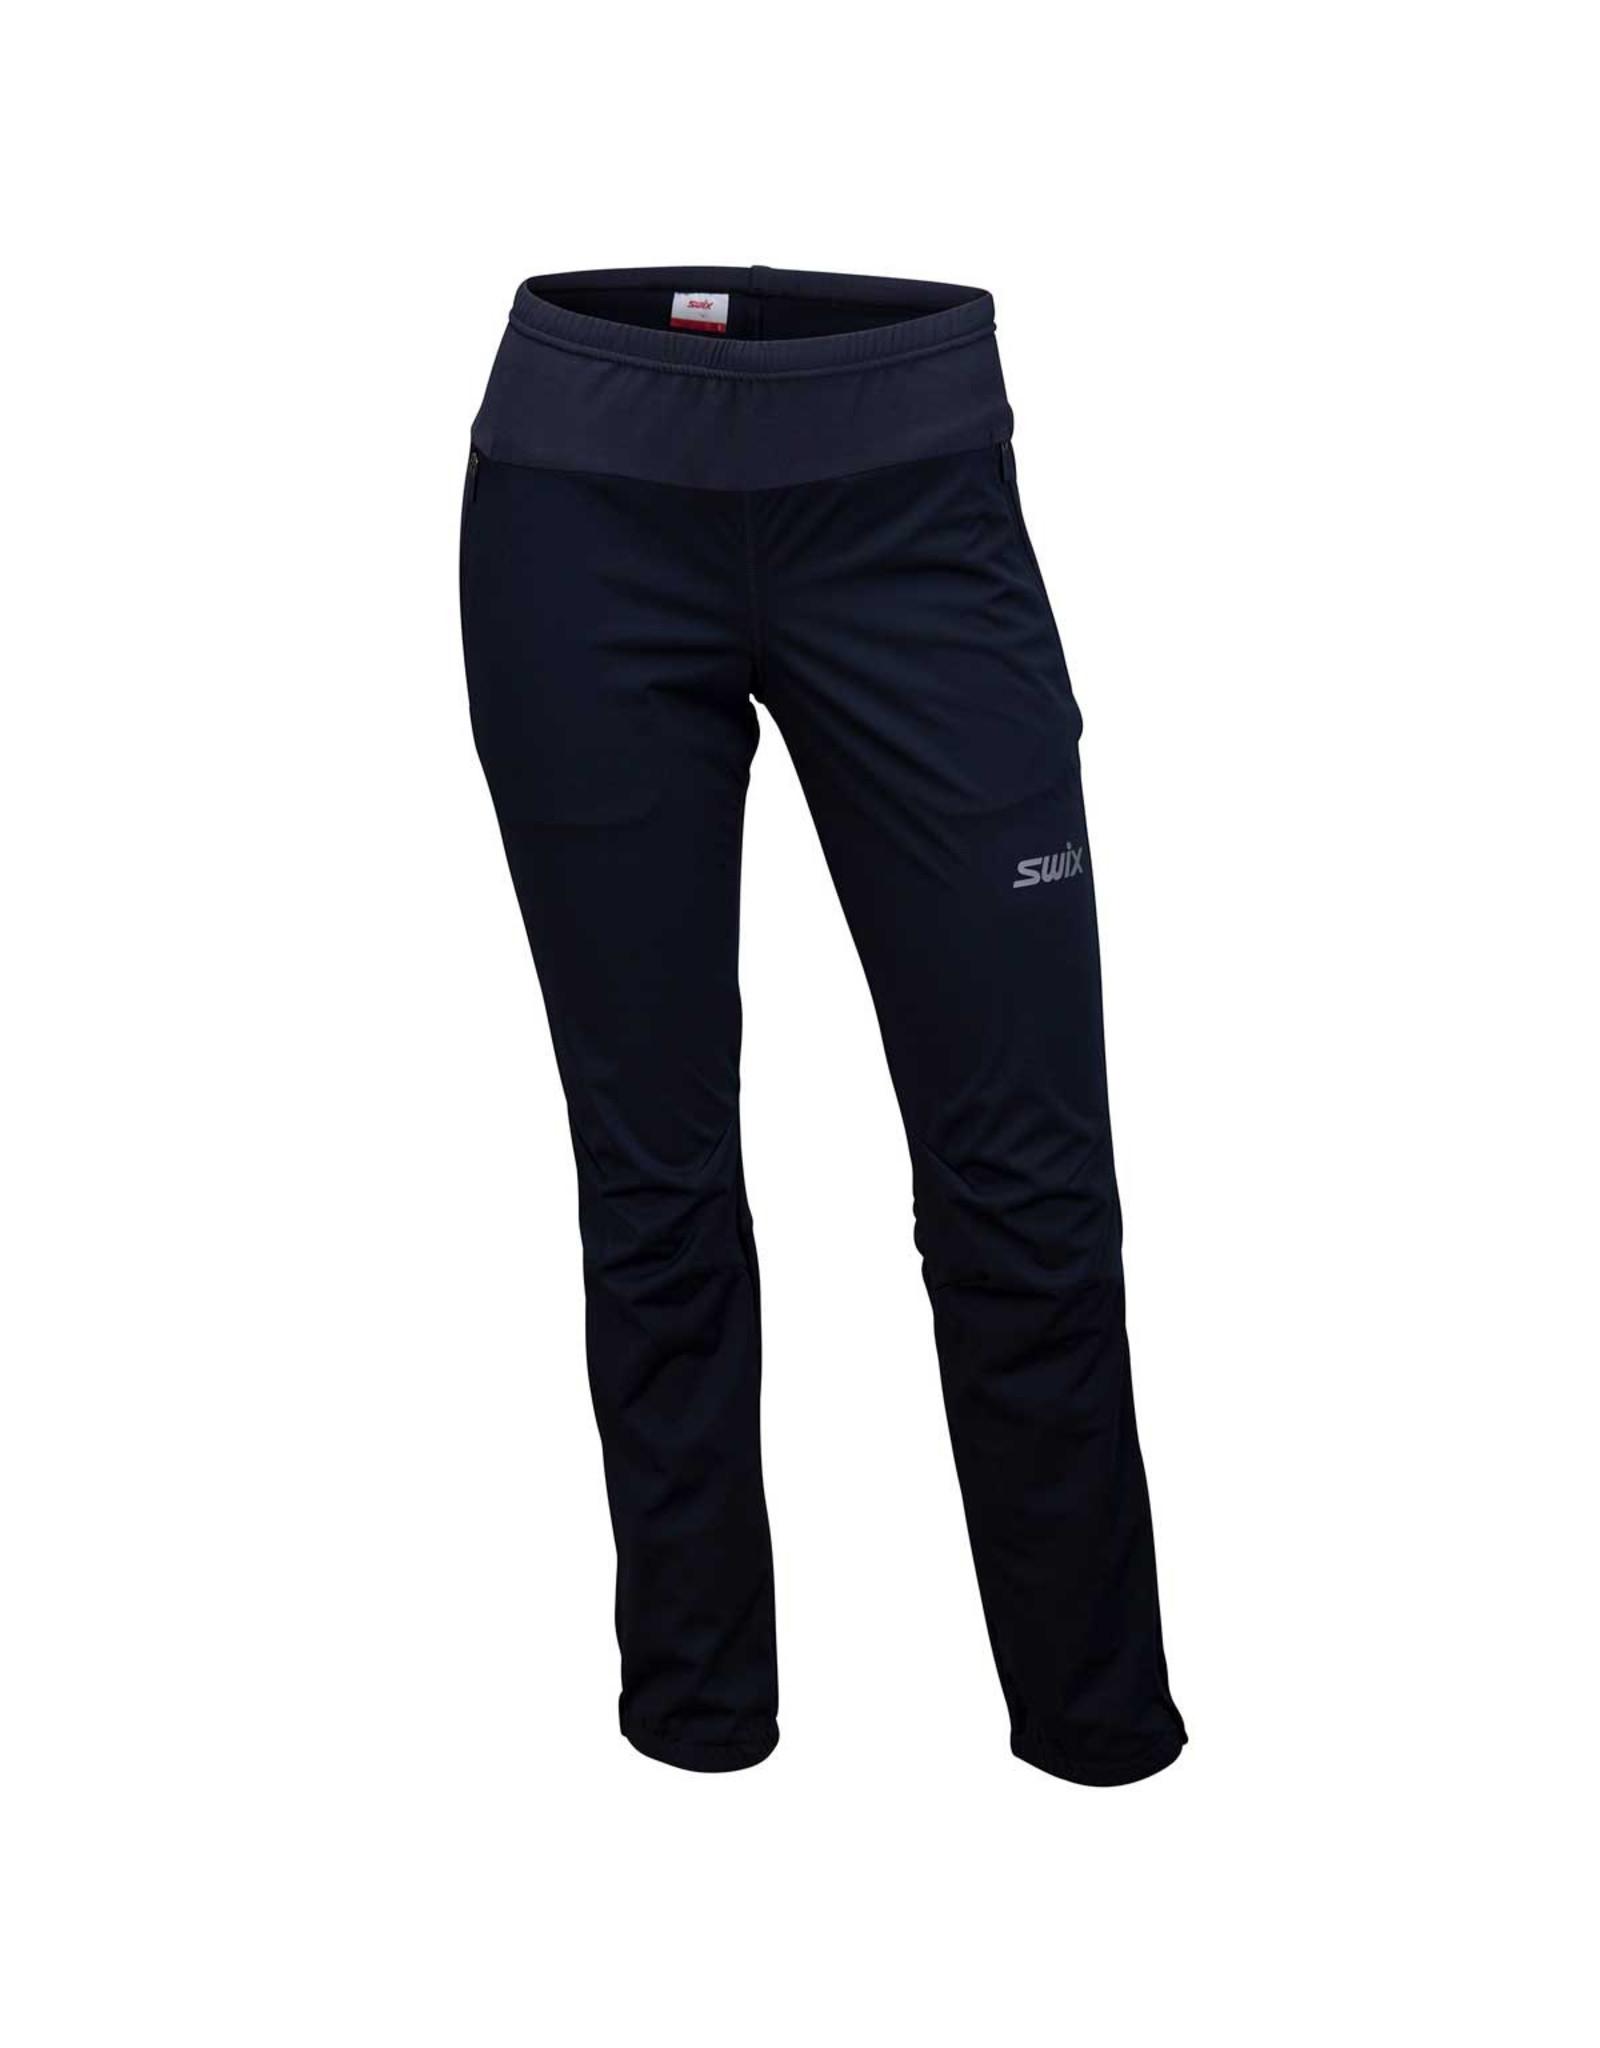 Swix Cross pants Ws XL (75100) Dark navy